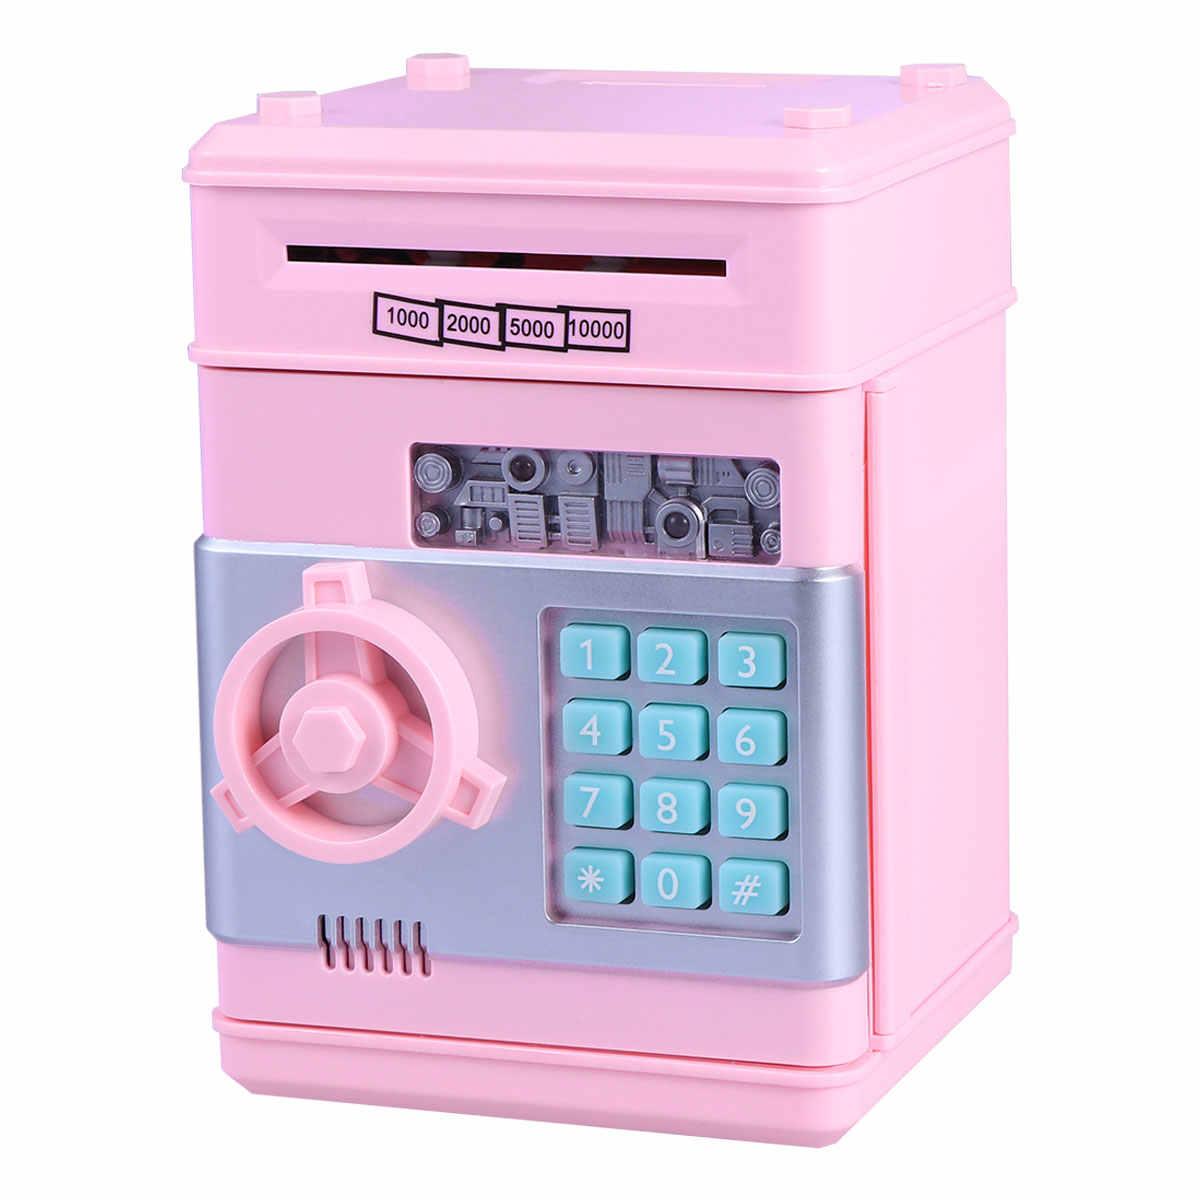 Electronic Piggy Bank Atm Pword Money Box Cash Coins Saving Safe Deposit Banknote Christmas Gift